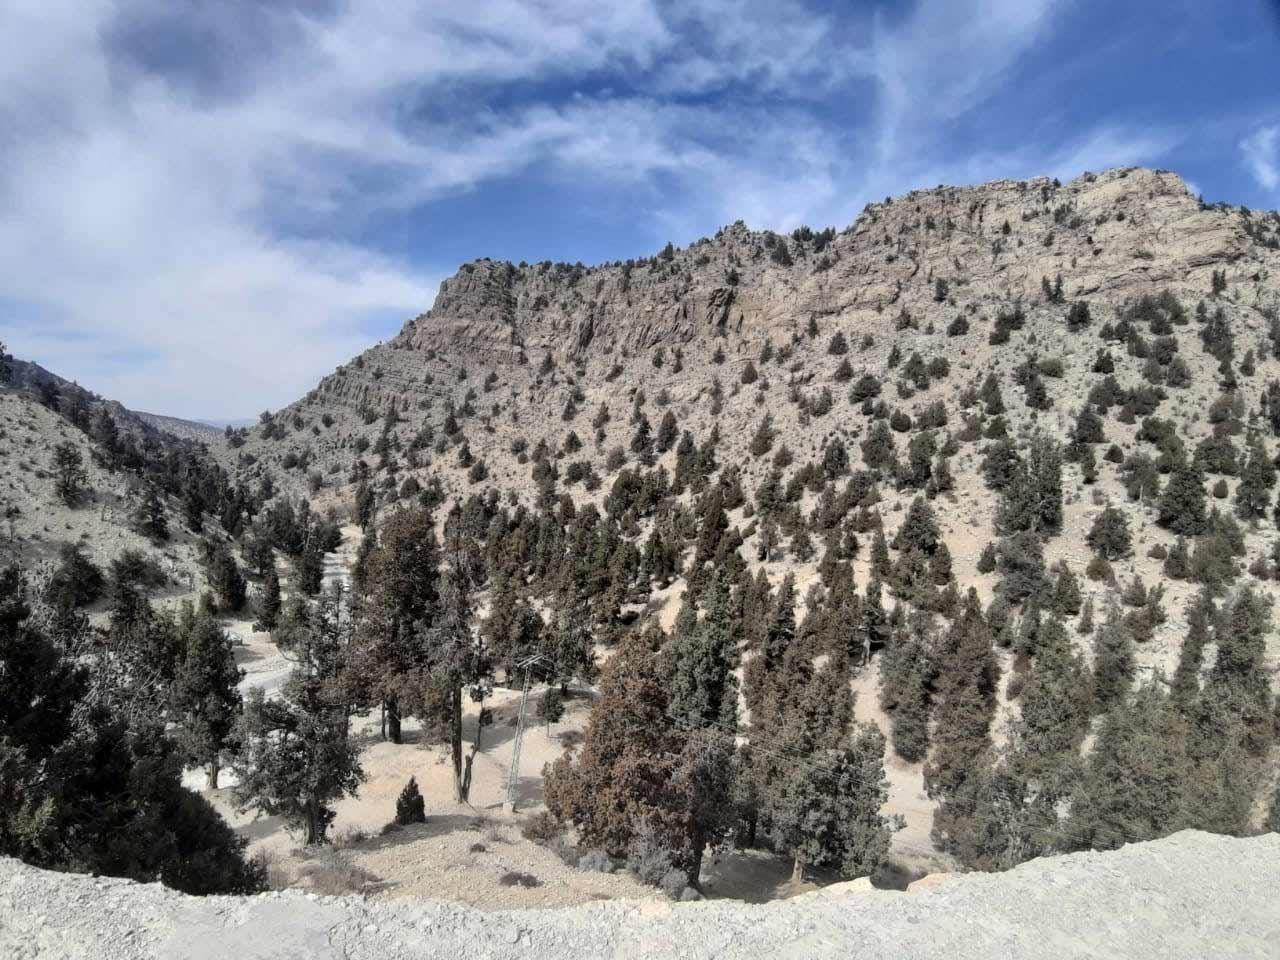 A nice click of Quetta Mountains